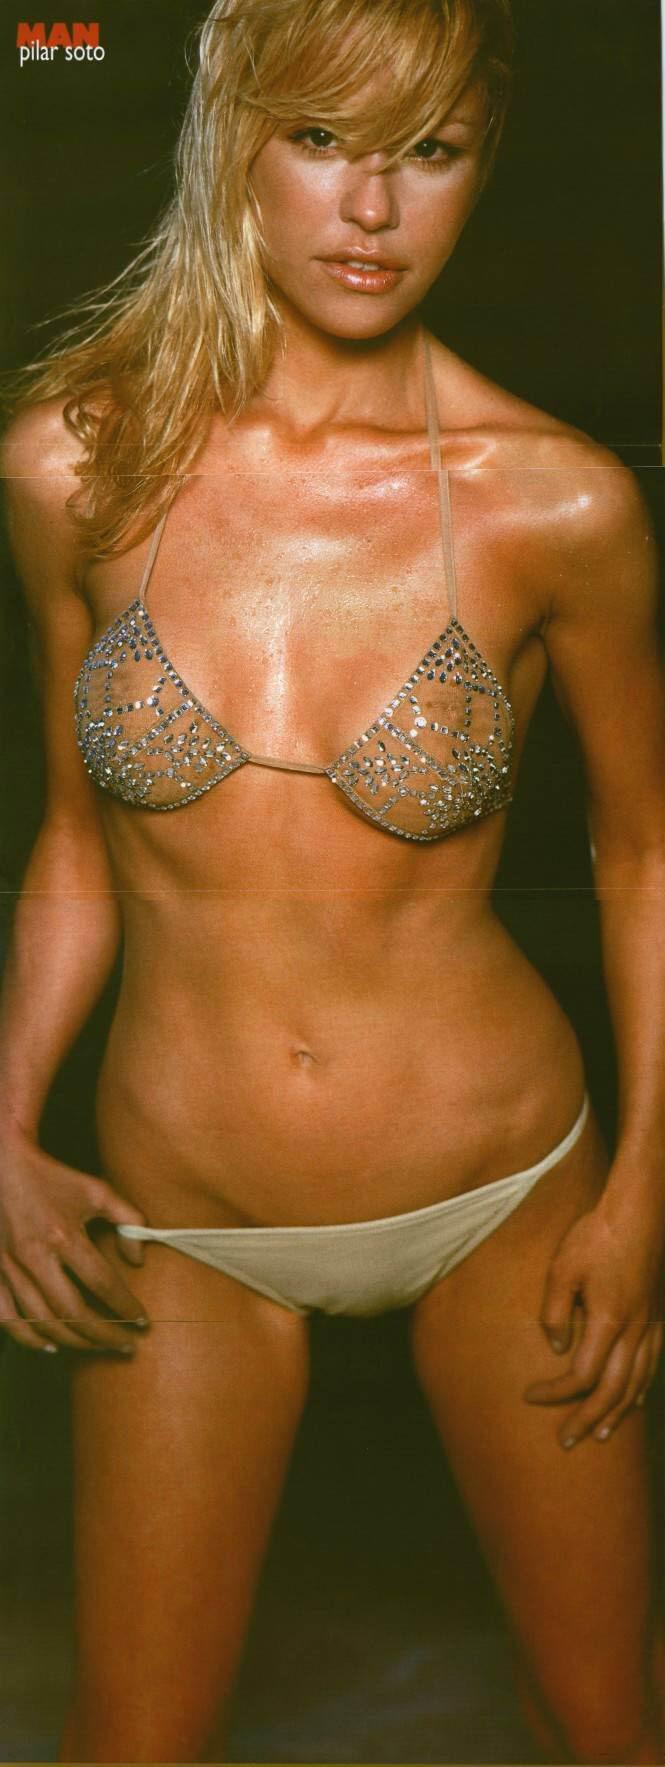 Pilar Soto Desnuda Página 2 Fotos Desnuda Descuido Topless